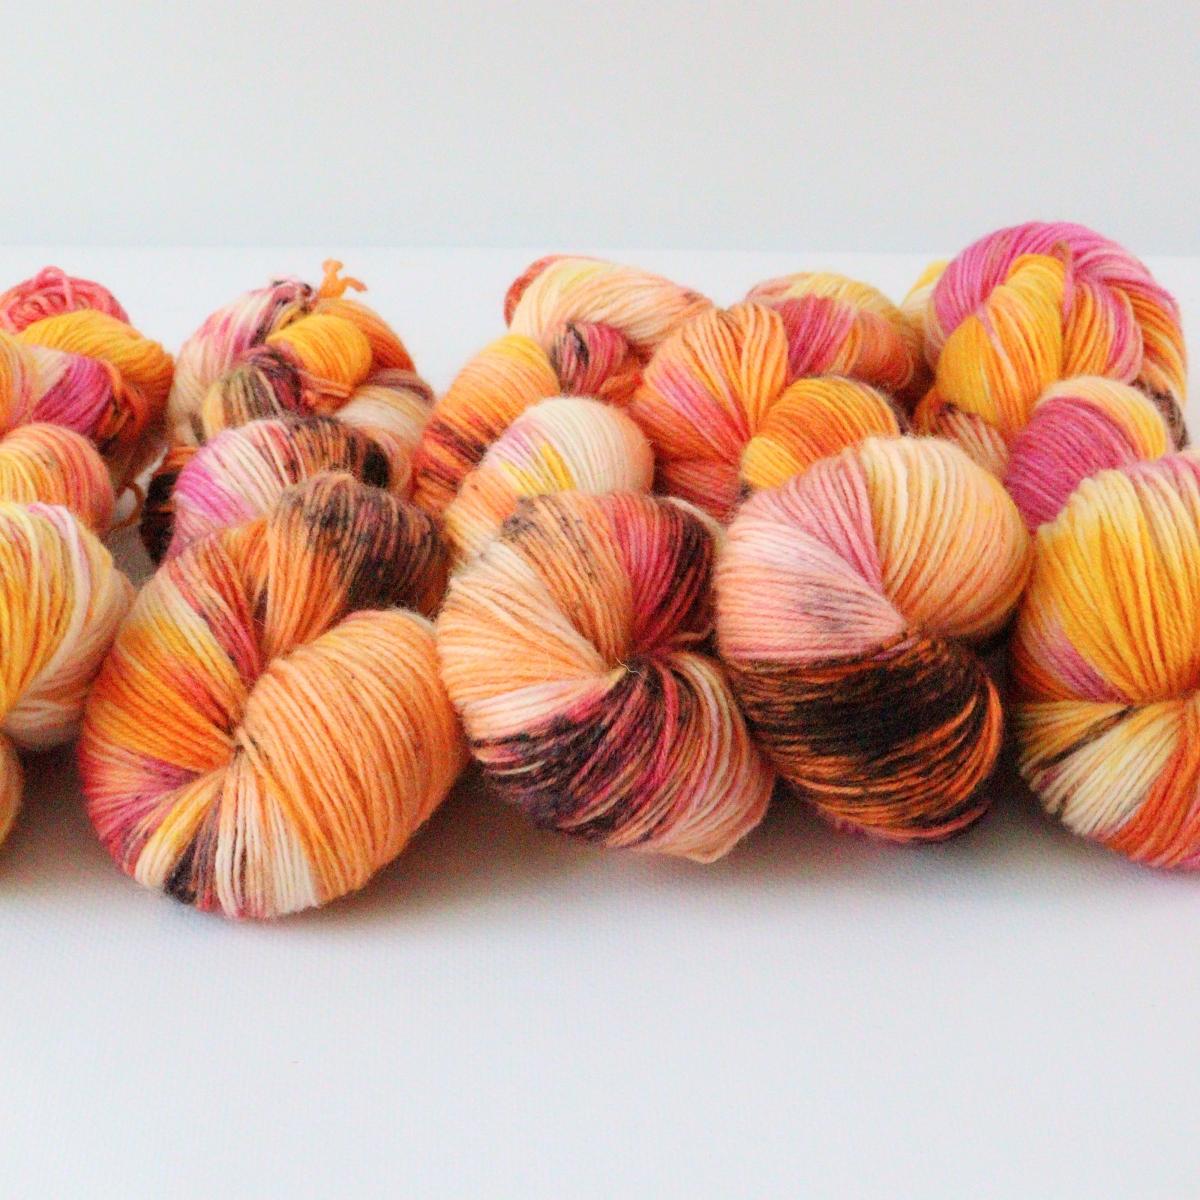 woodico.pro hand dyed yarn 083 3 1200x1200 - Hand dyed yarn / 083